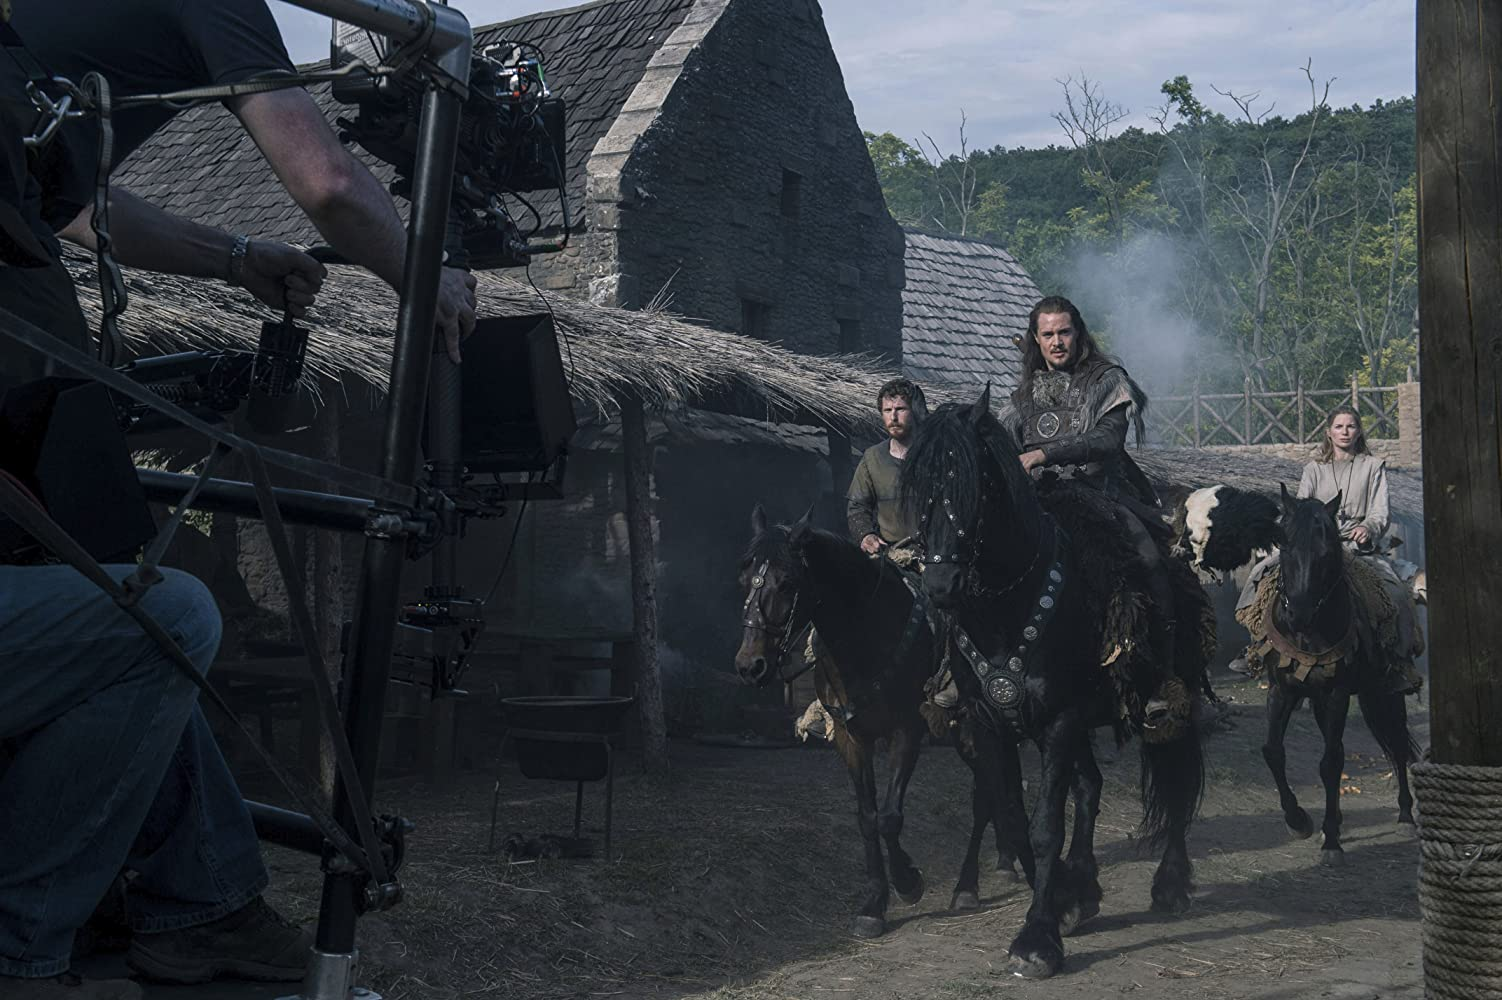 The Last Kingdom : Season 1-3 Complete BluRay 480p & 720p | GDrive | MEGA | Single Episodes | BSub